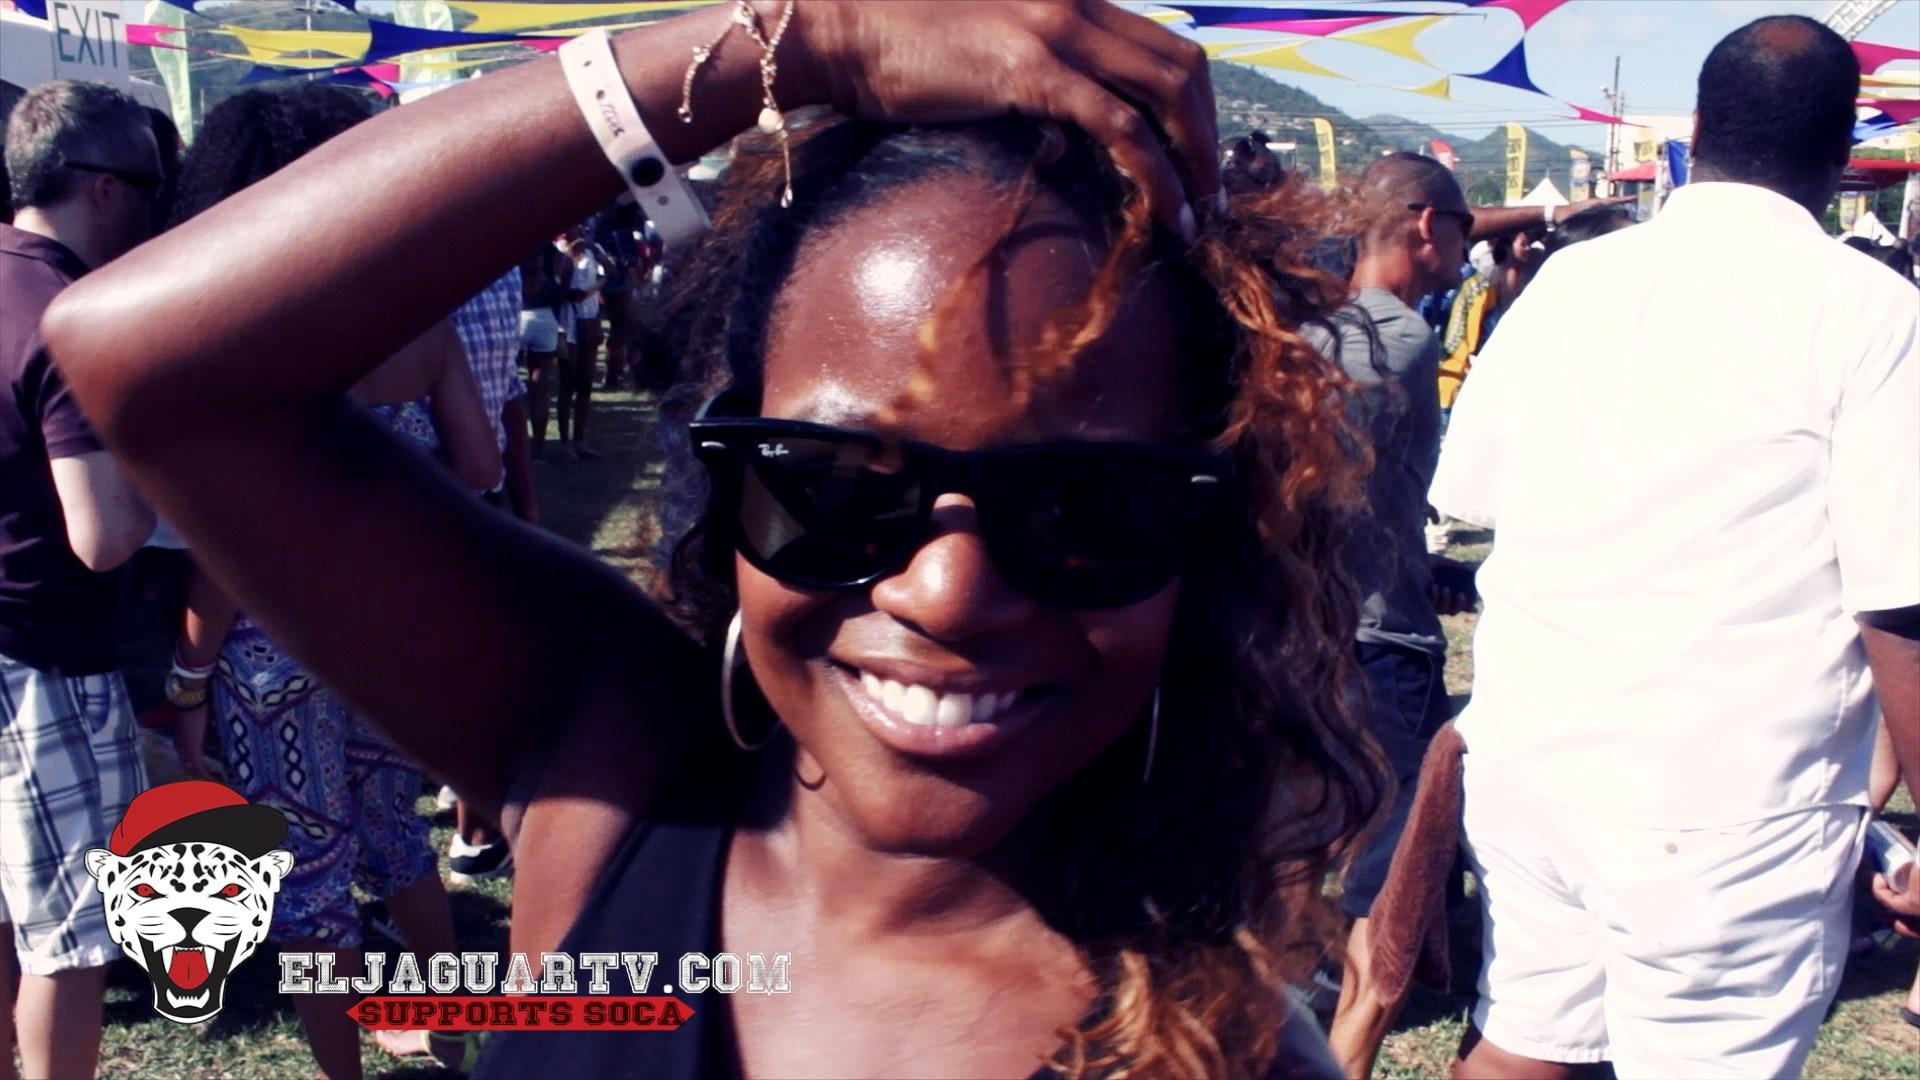 Trinidad Carnival 2015 ep 2 photo27.jpg